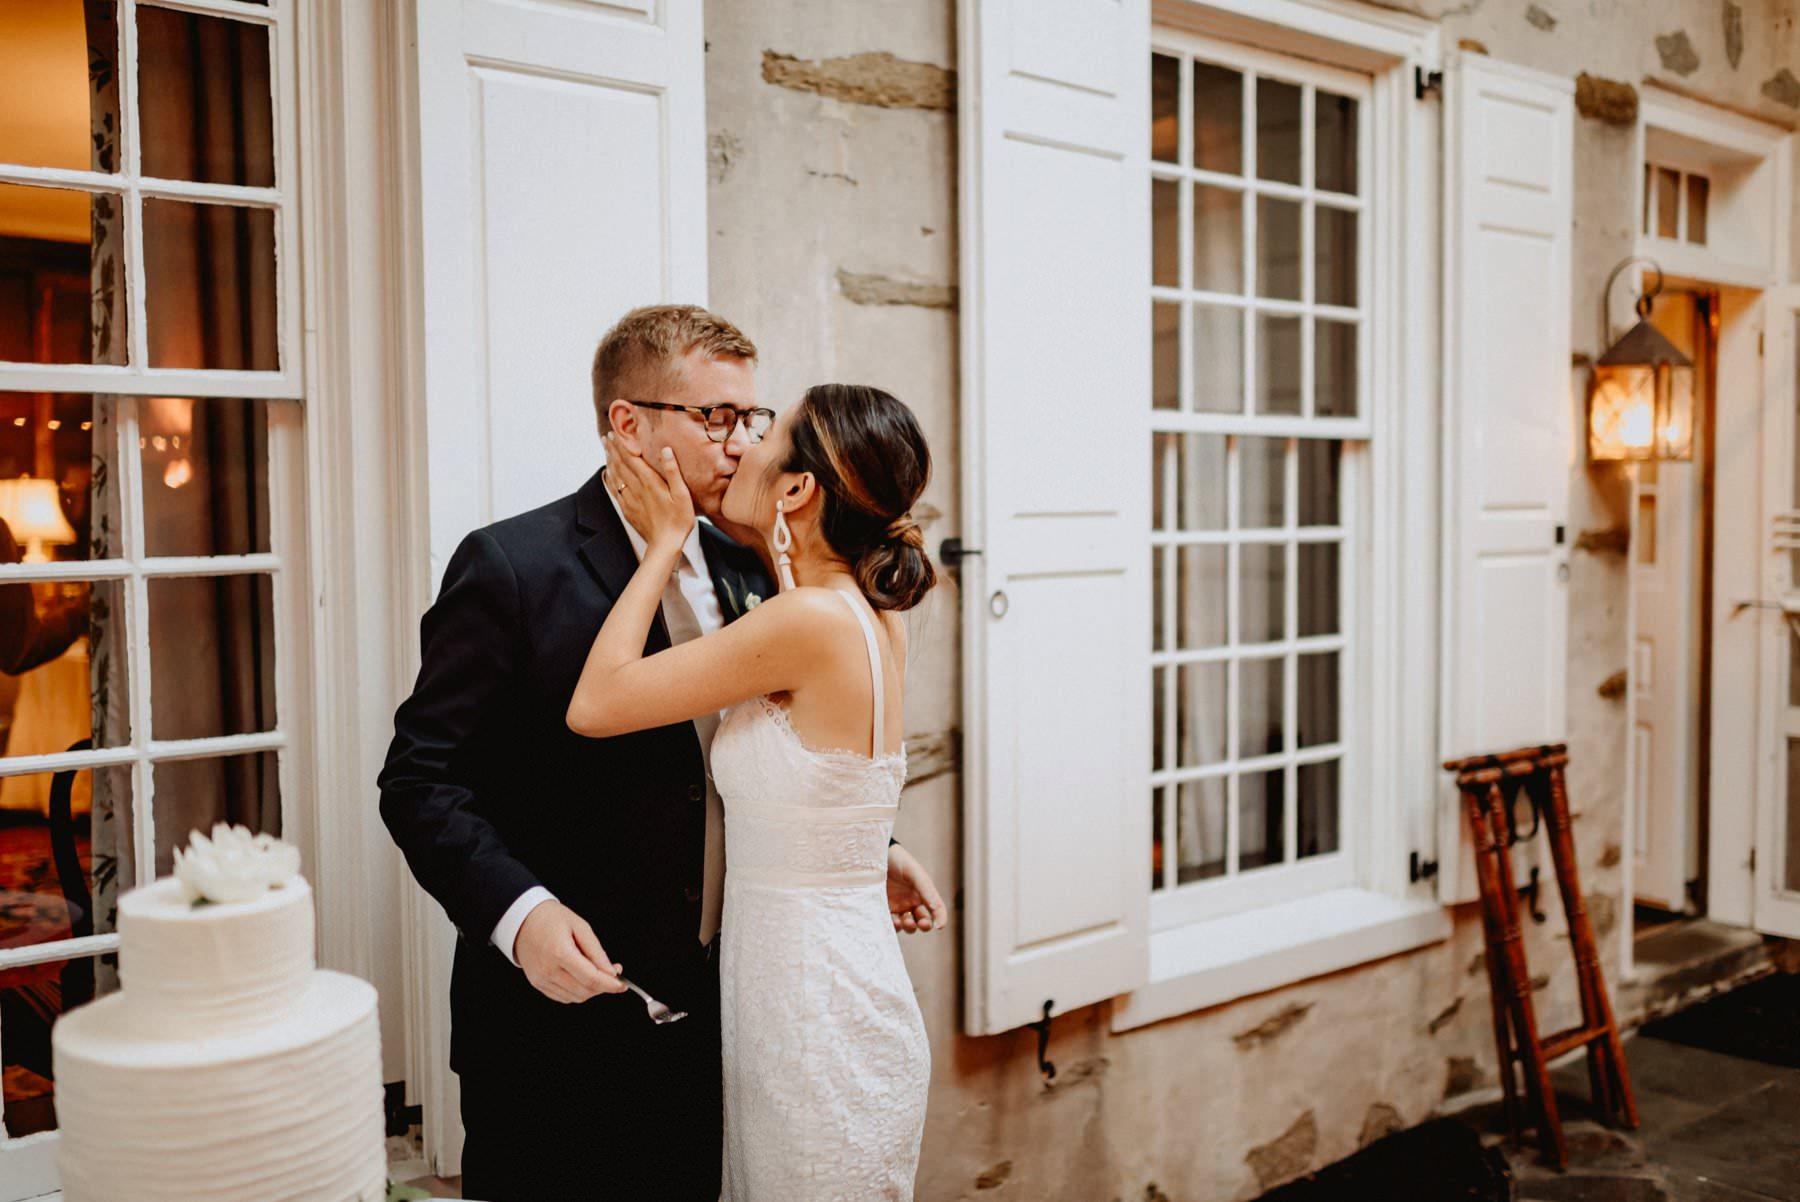 Appleford-estate-wedding-129.jpg